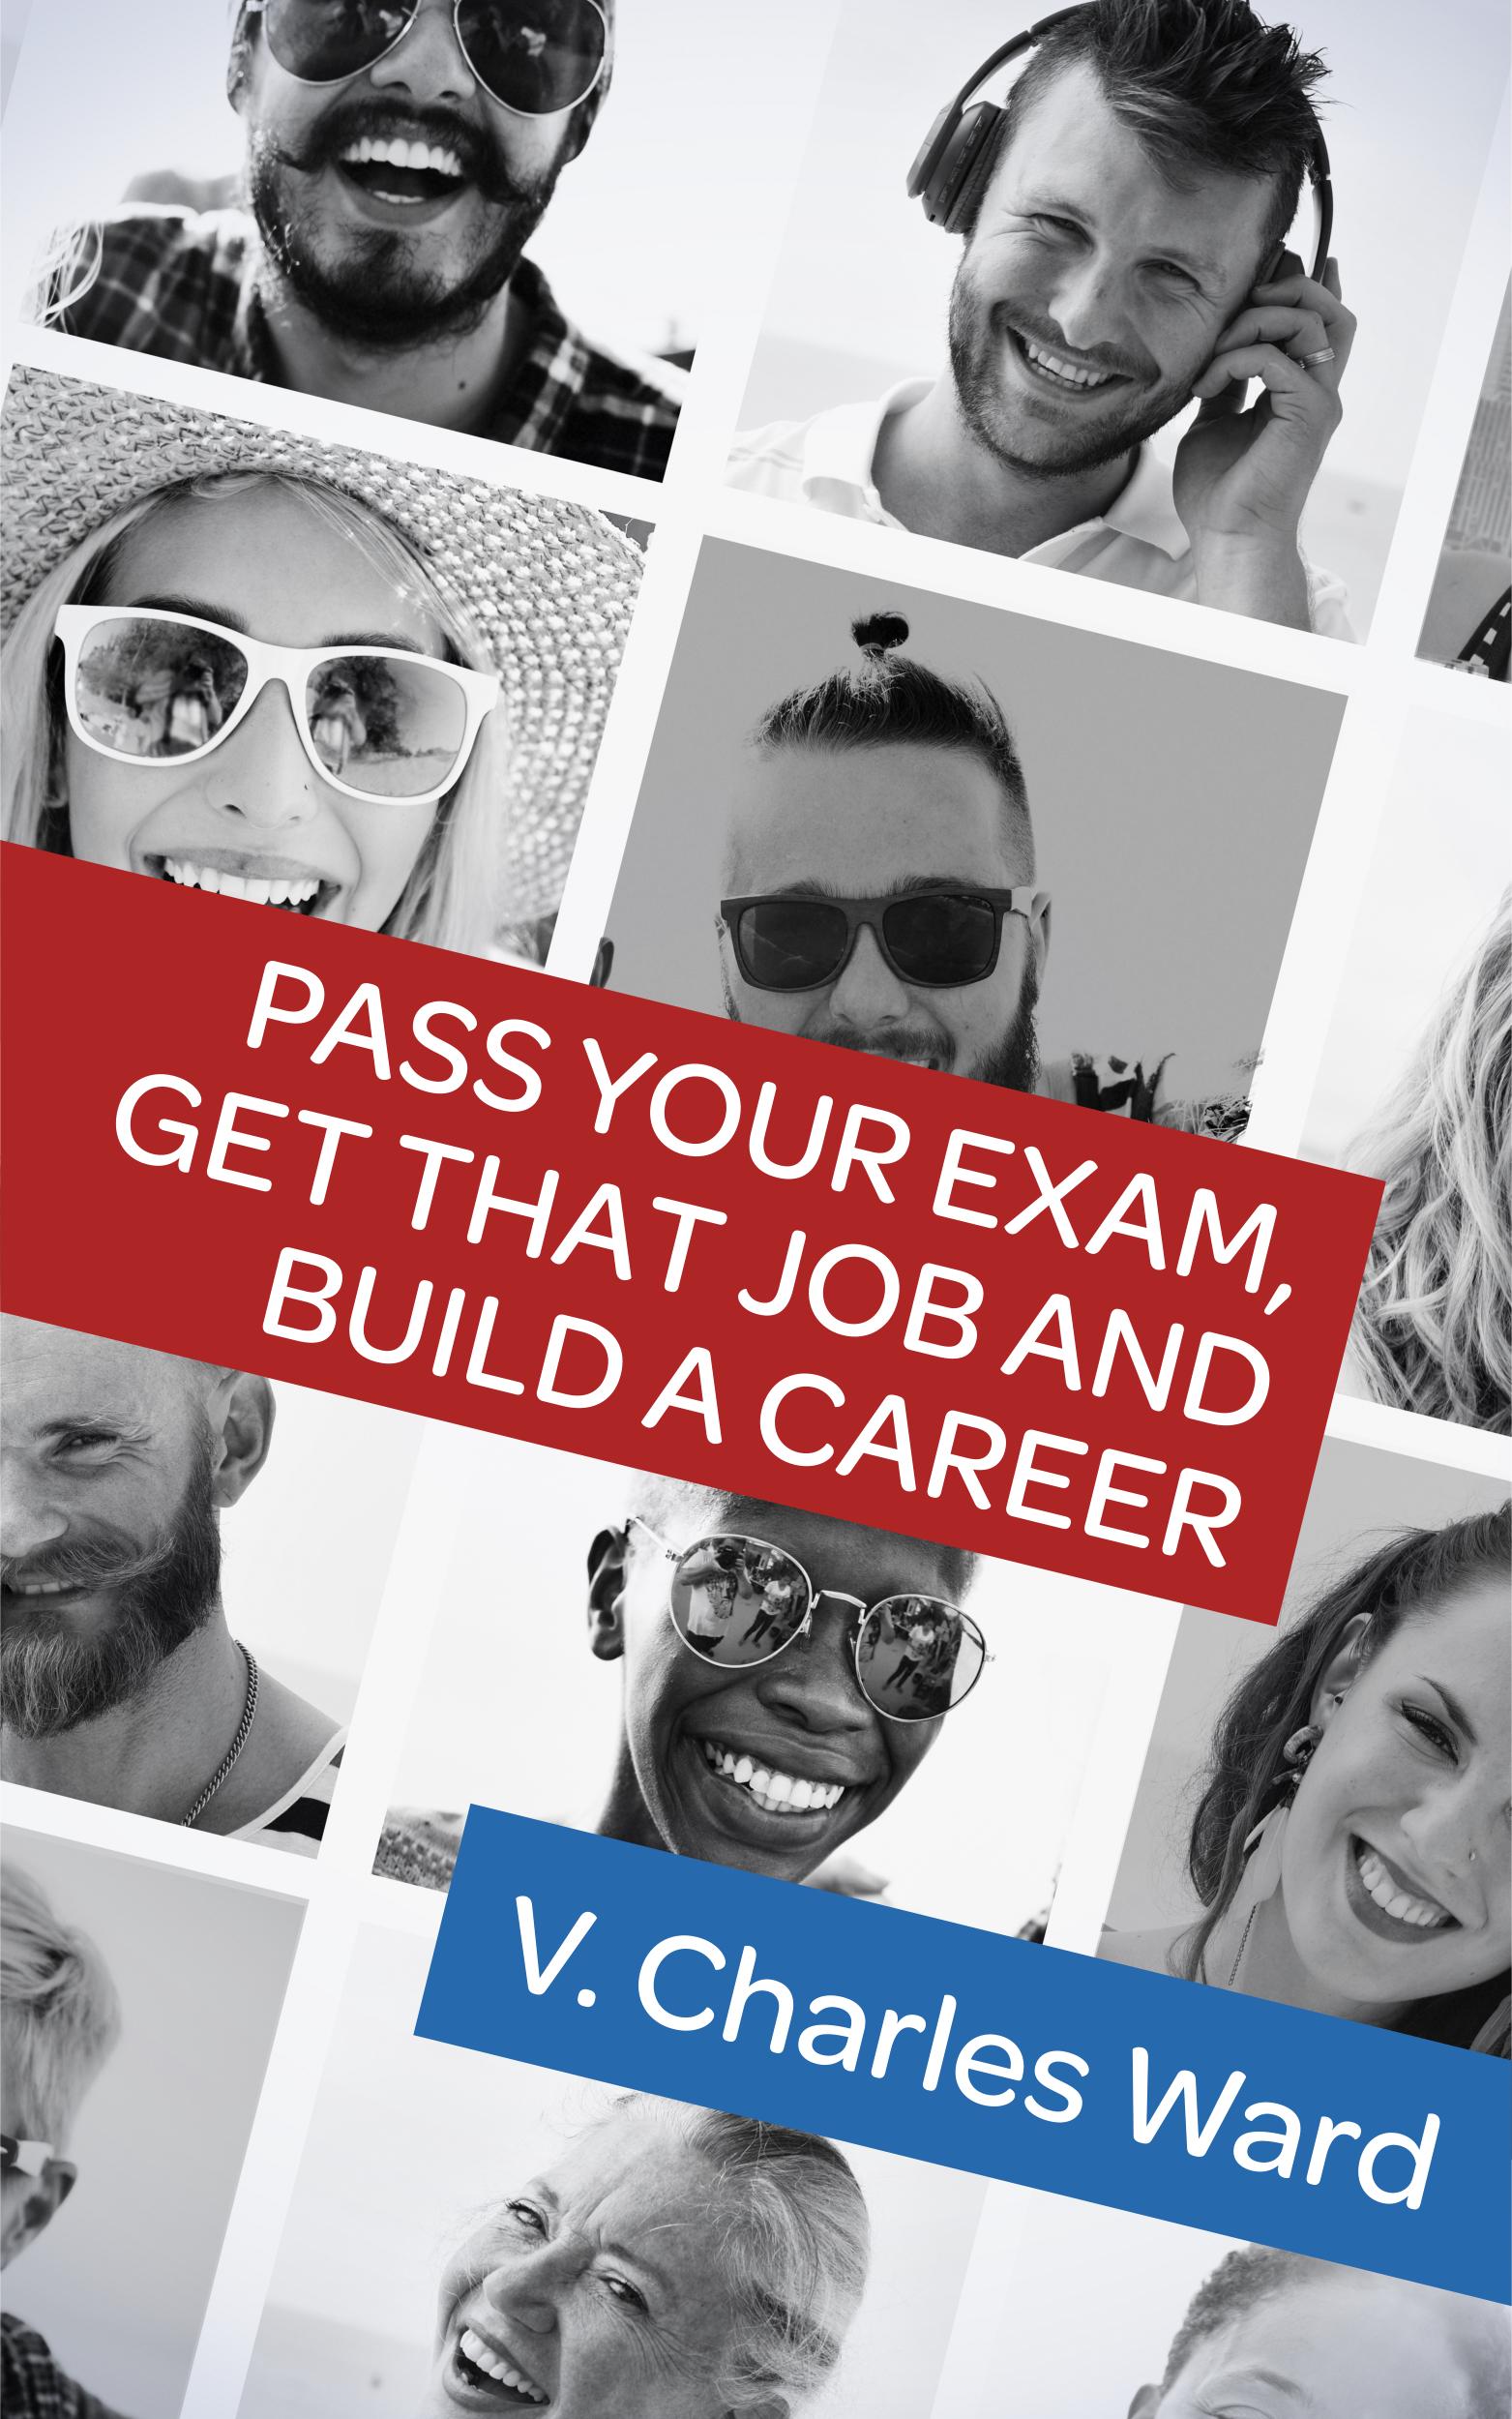 Pass Your Exam - High Resolution[22430]